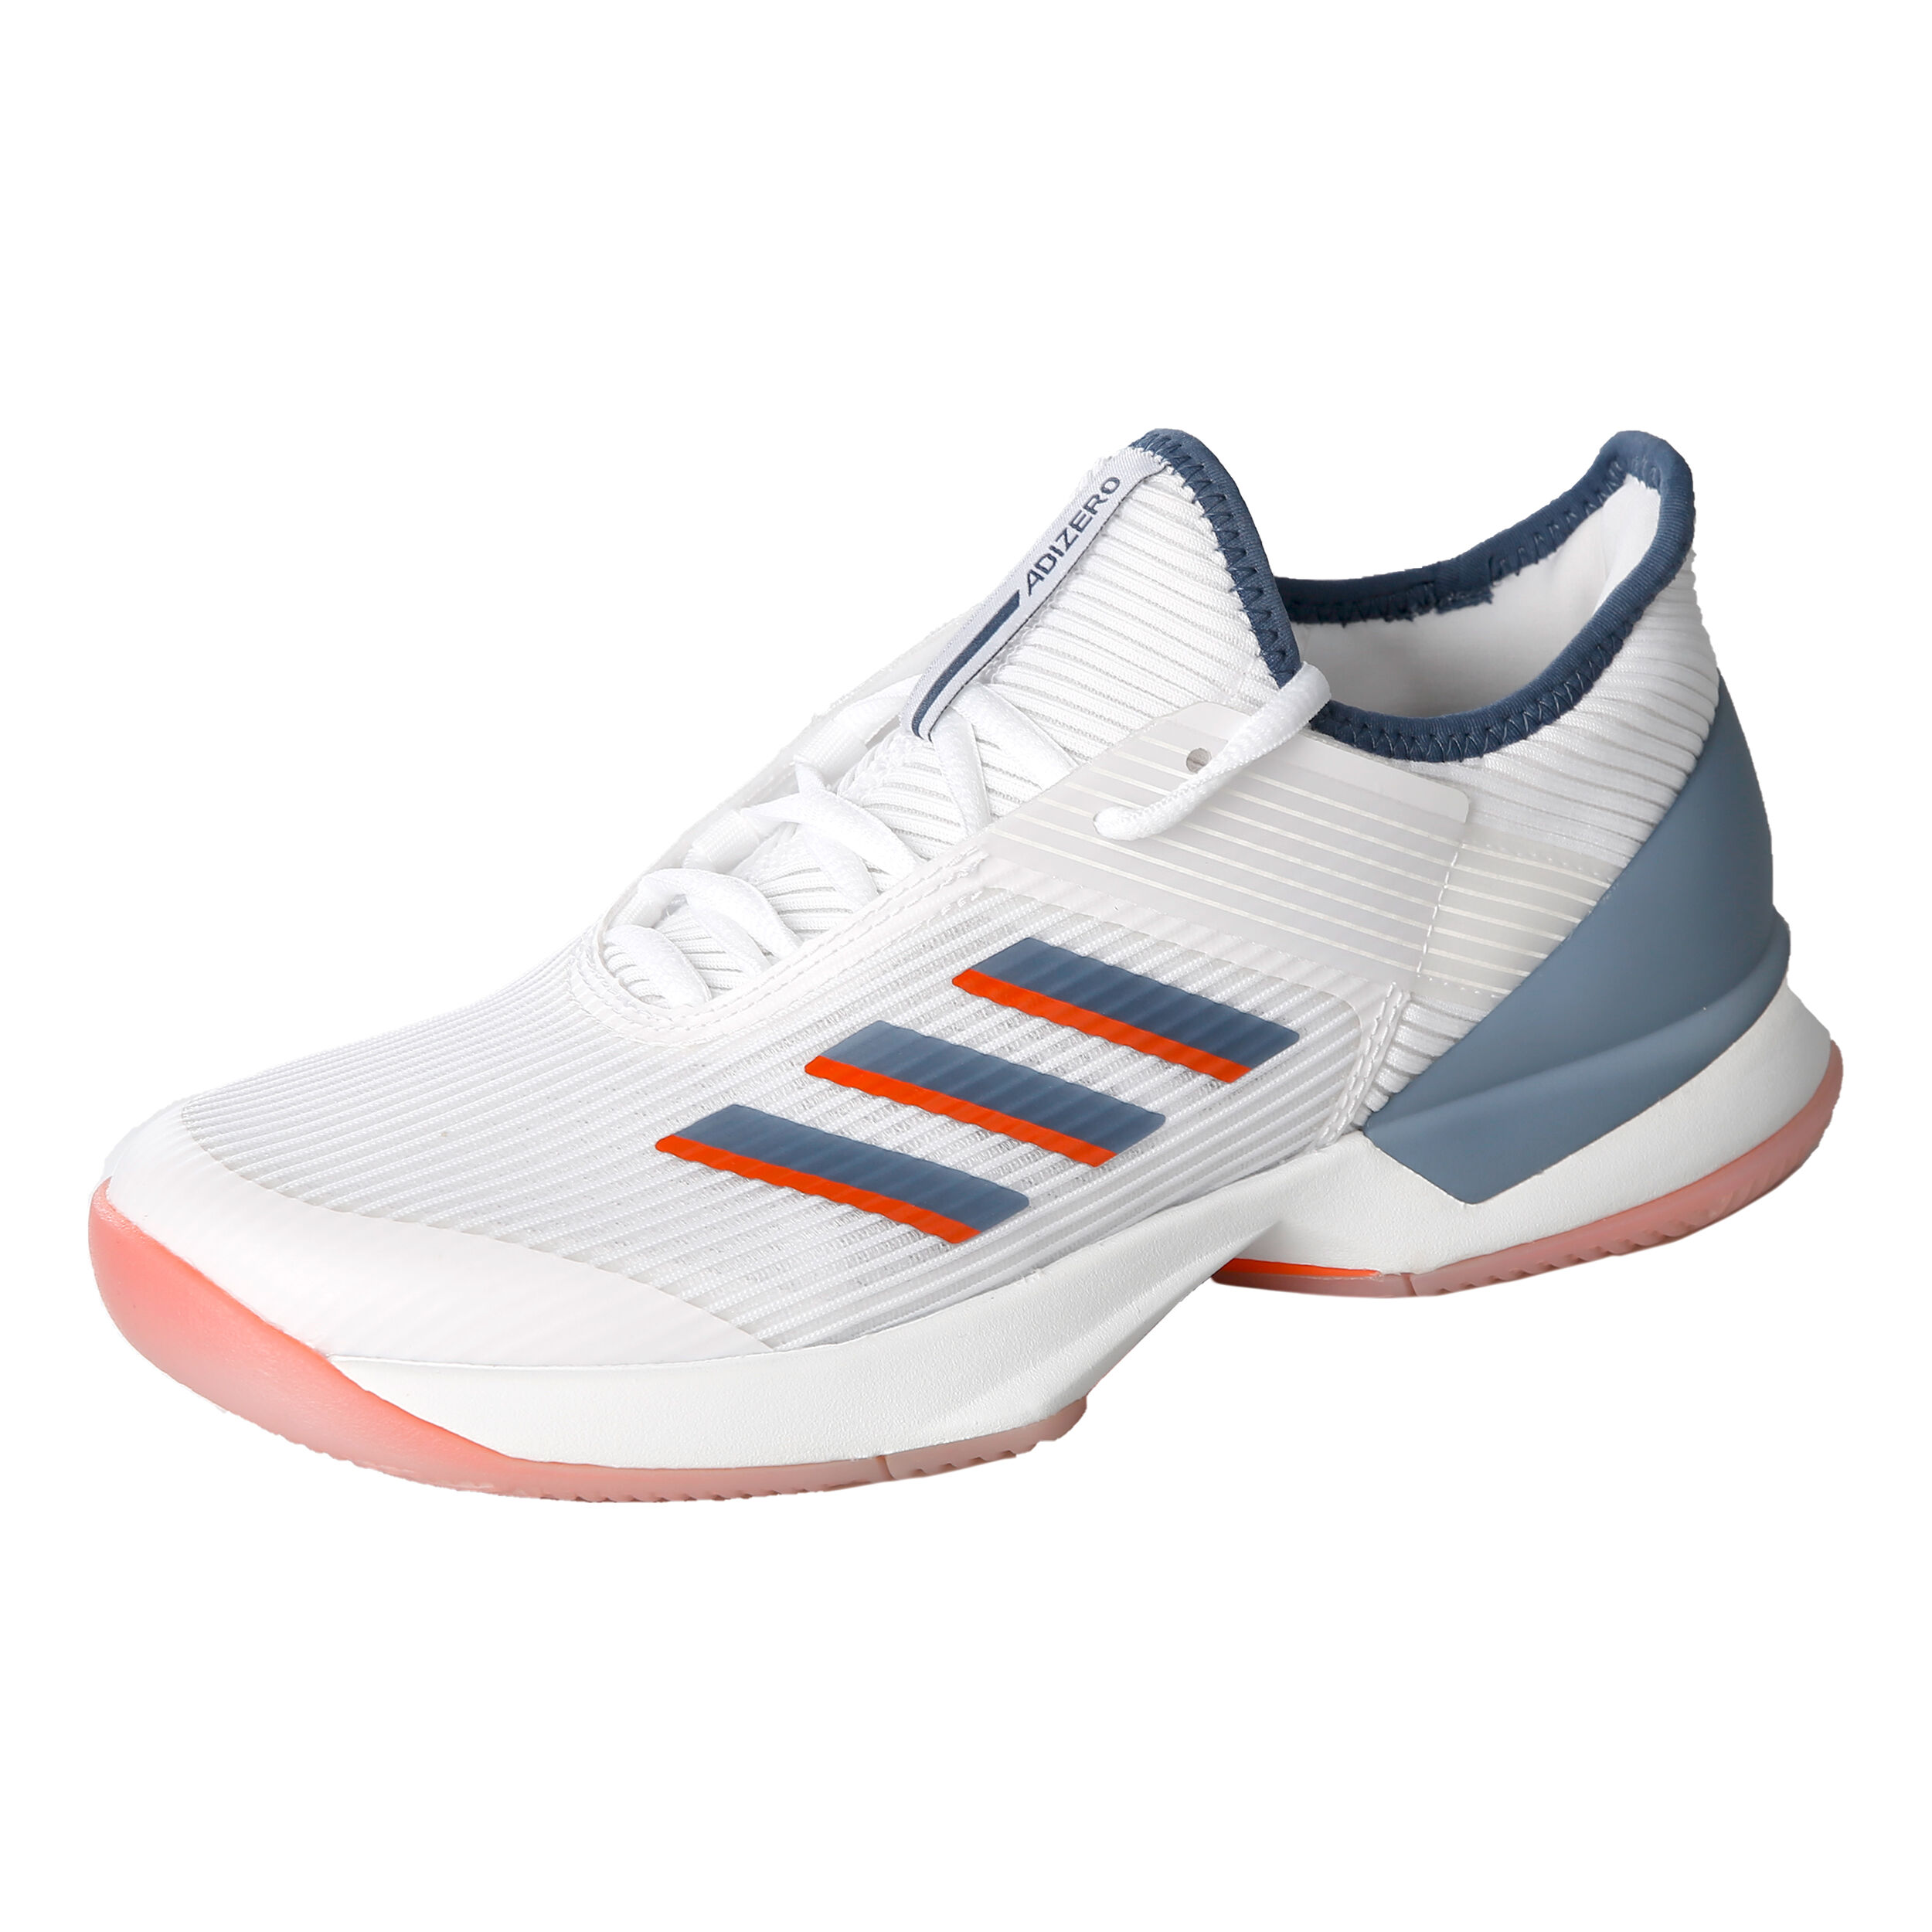 Scarpe da tennis per Donna compra online | Tennis Point